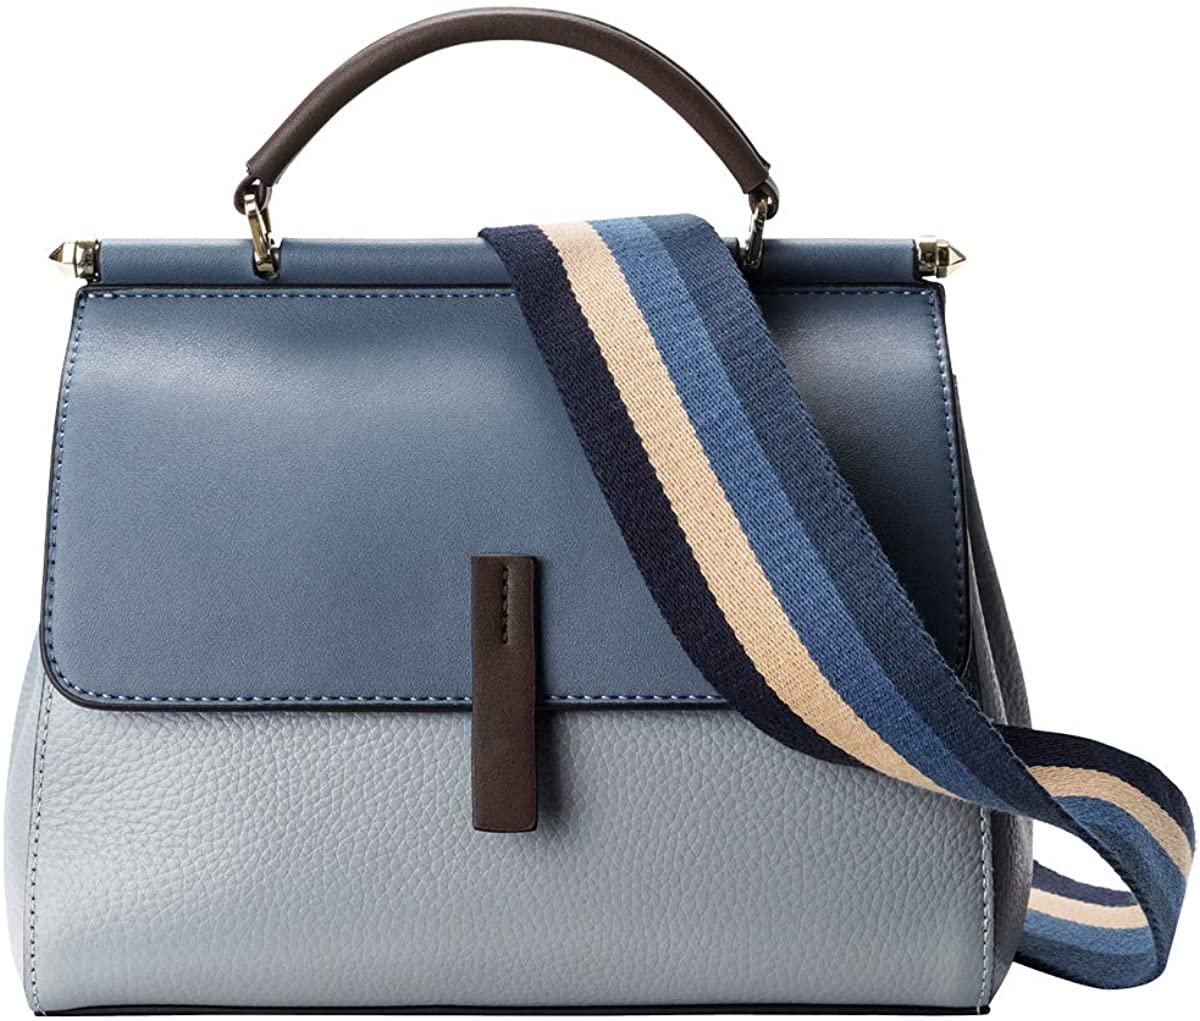 LAORENTOU Genuine Leather Handbags for Women Shoulder Bags Ladies Satchel Crocodile Skin Purse Handle